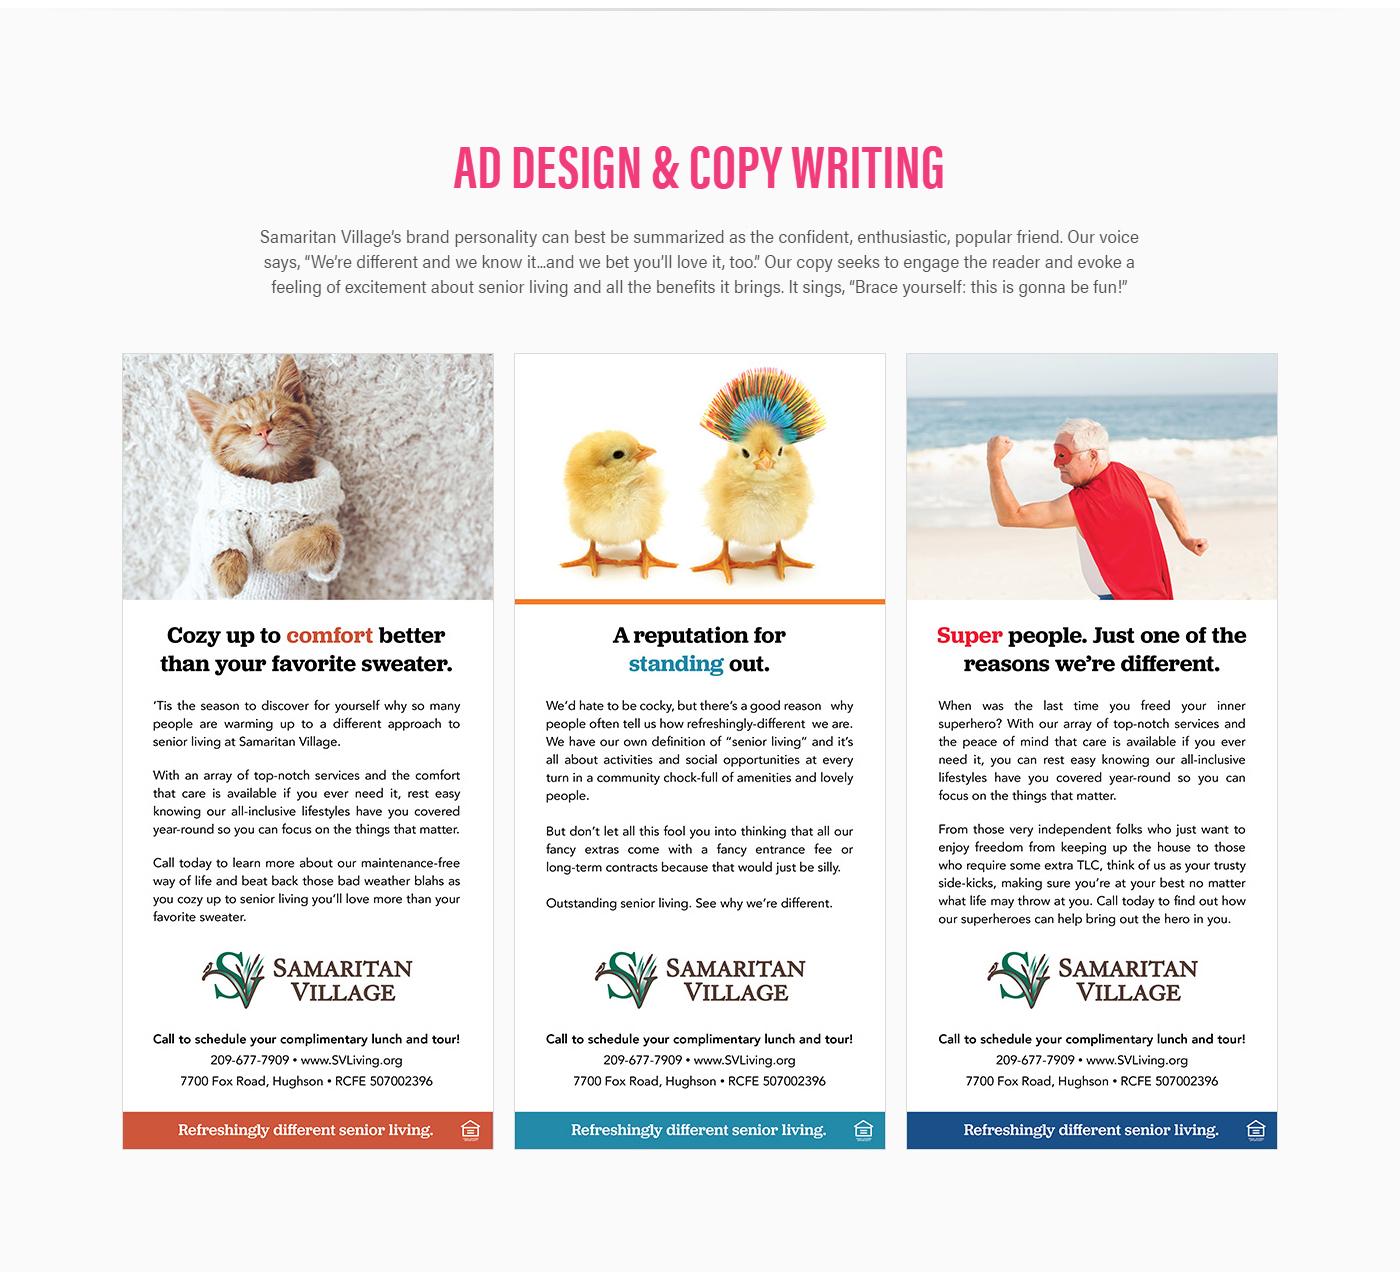 Web Design ,print design ,SEO,collateral design,cms blog,email marketing,social media marketing,senior housing,Retirement Community